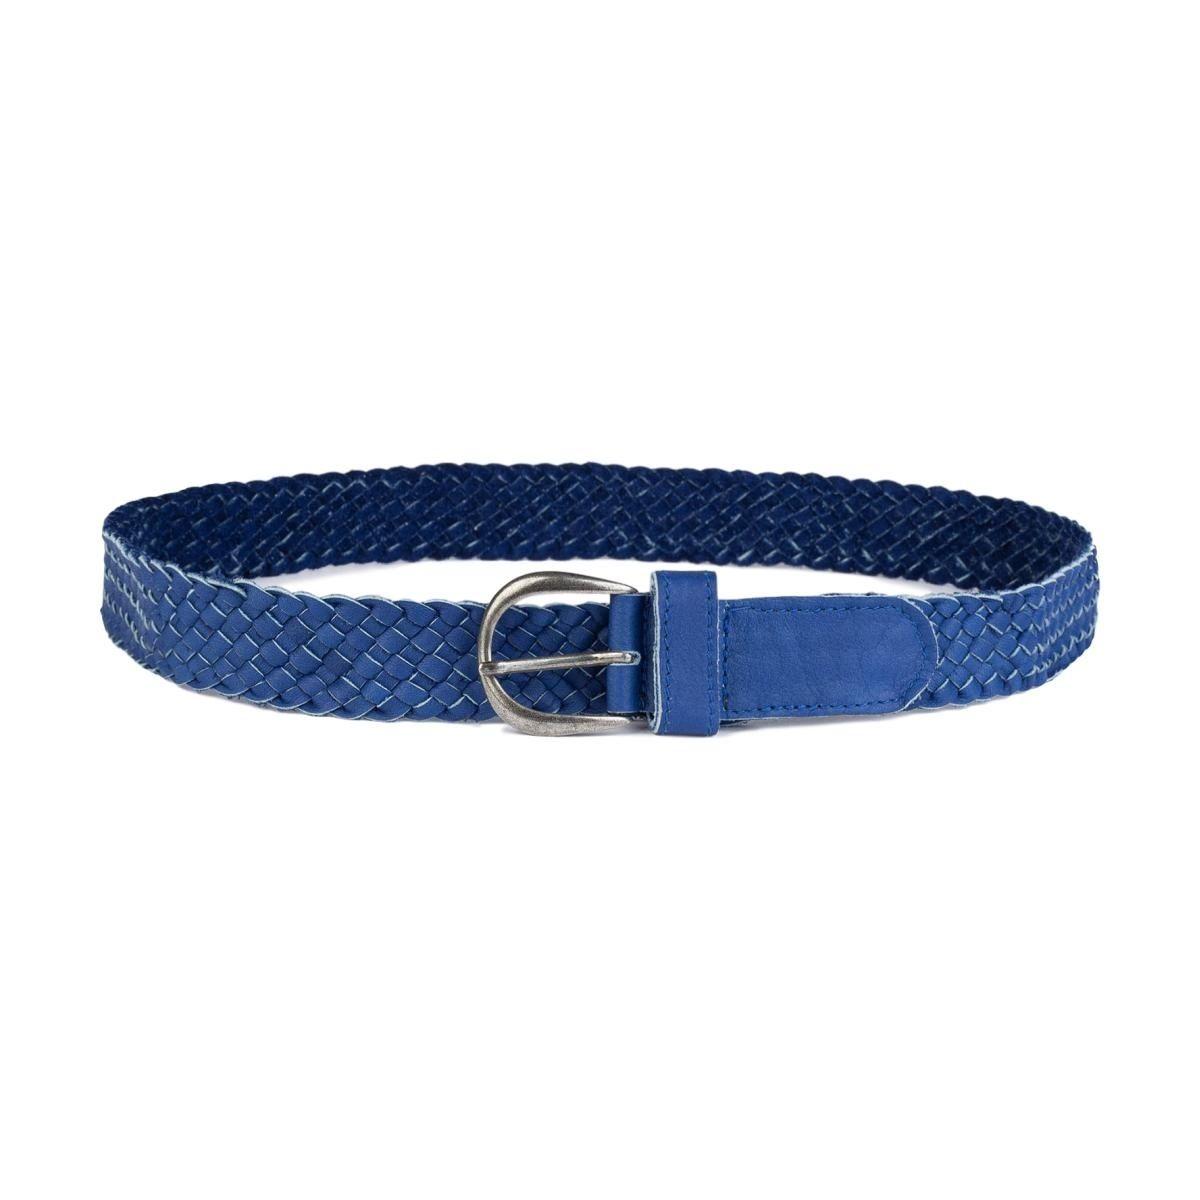 Ibis belt blue - The Animals Observatory